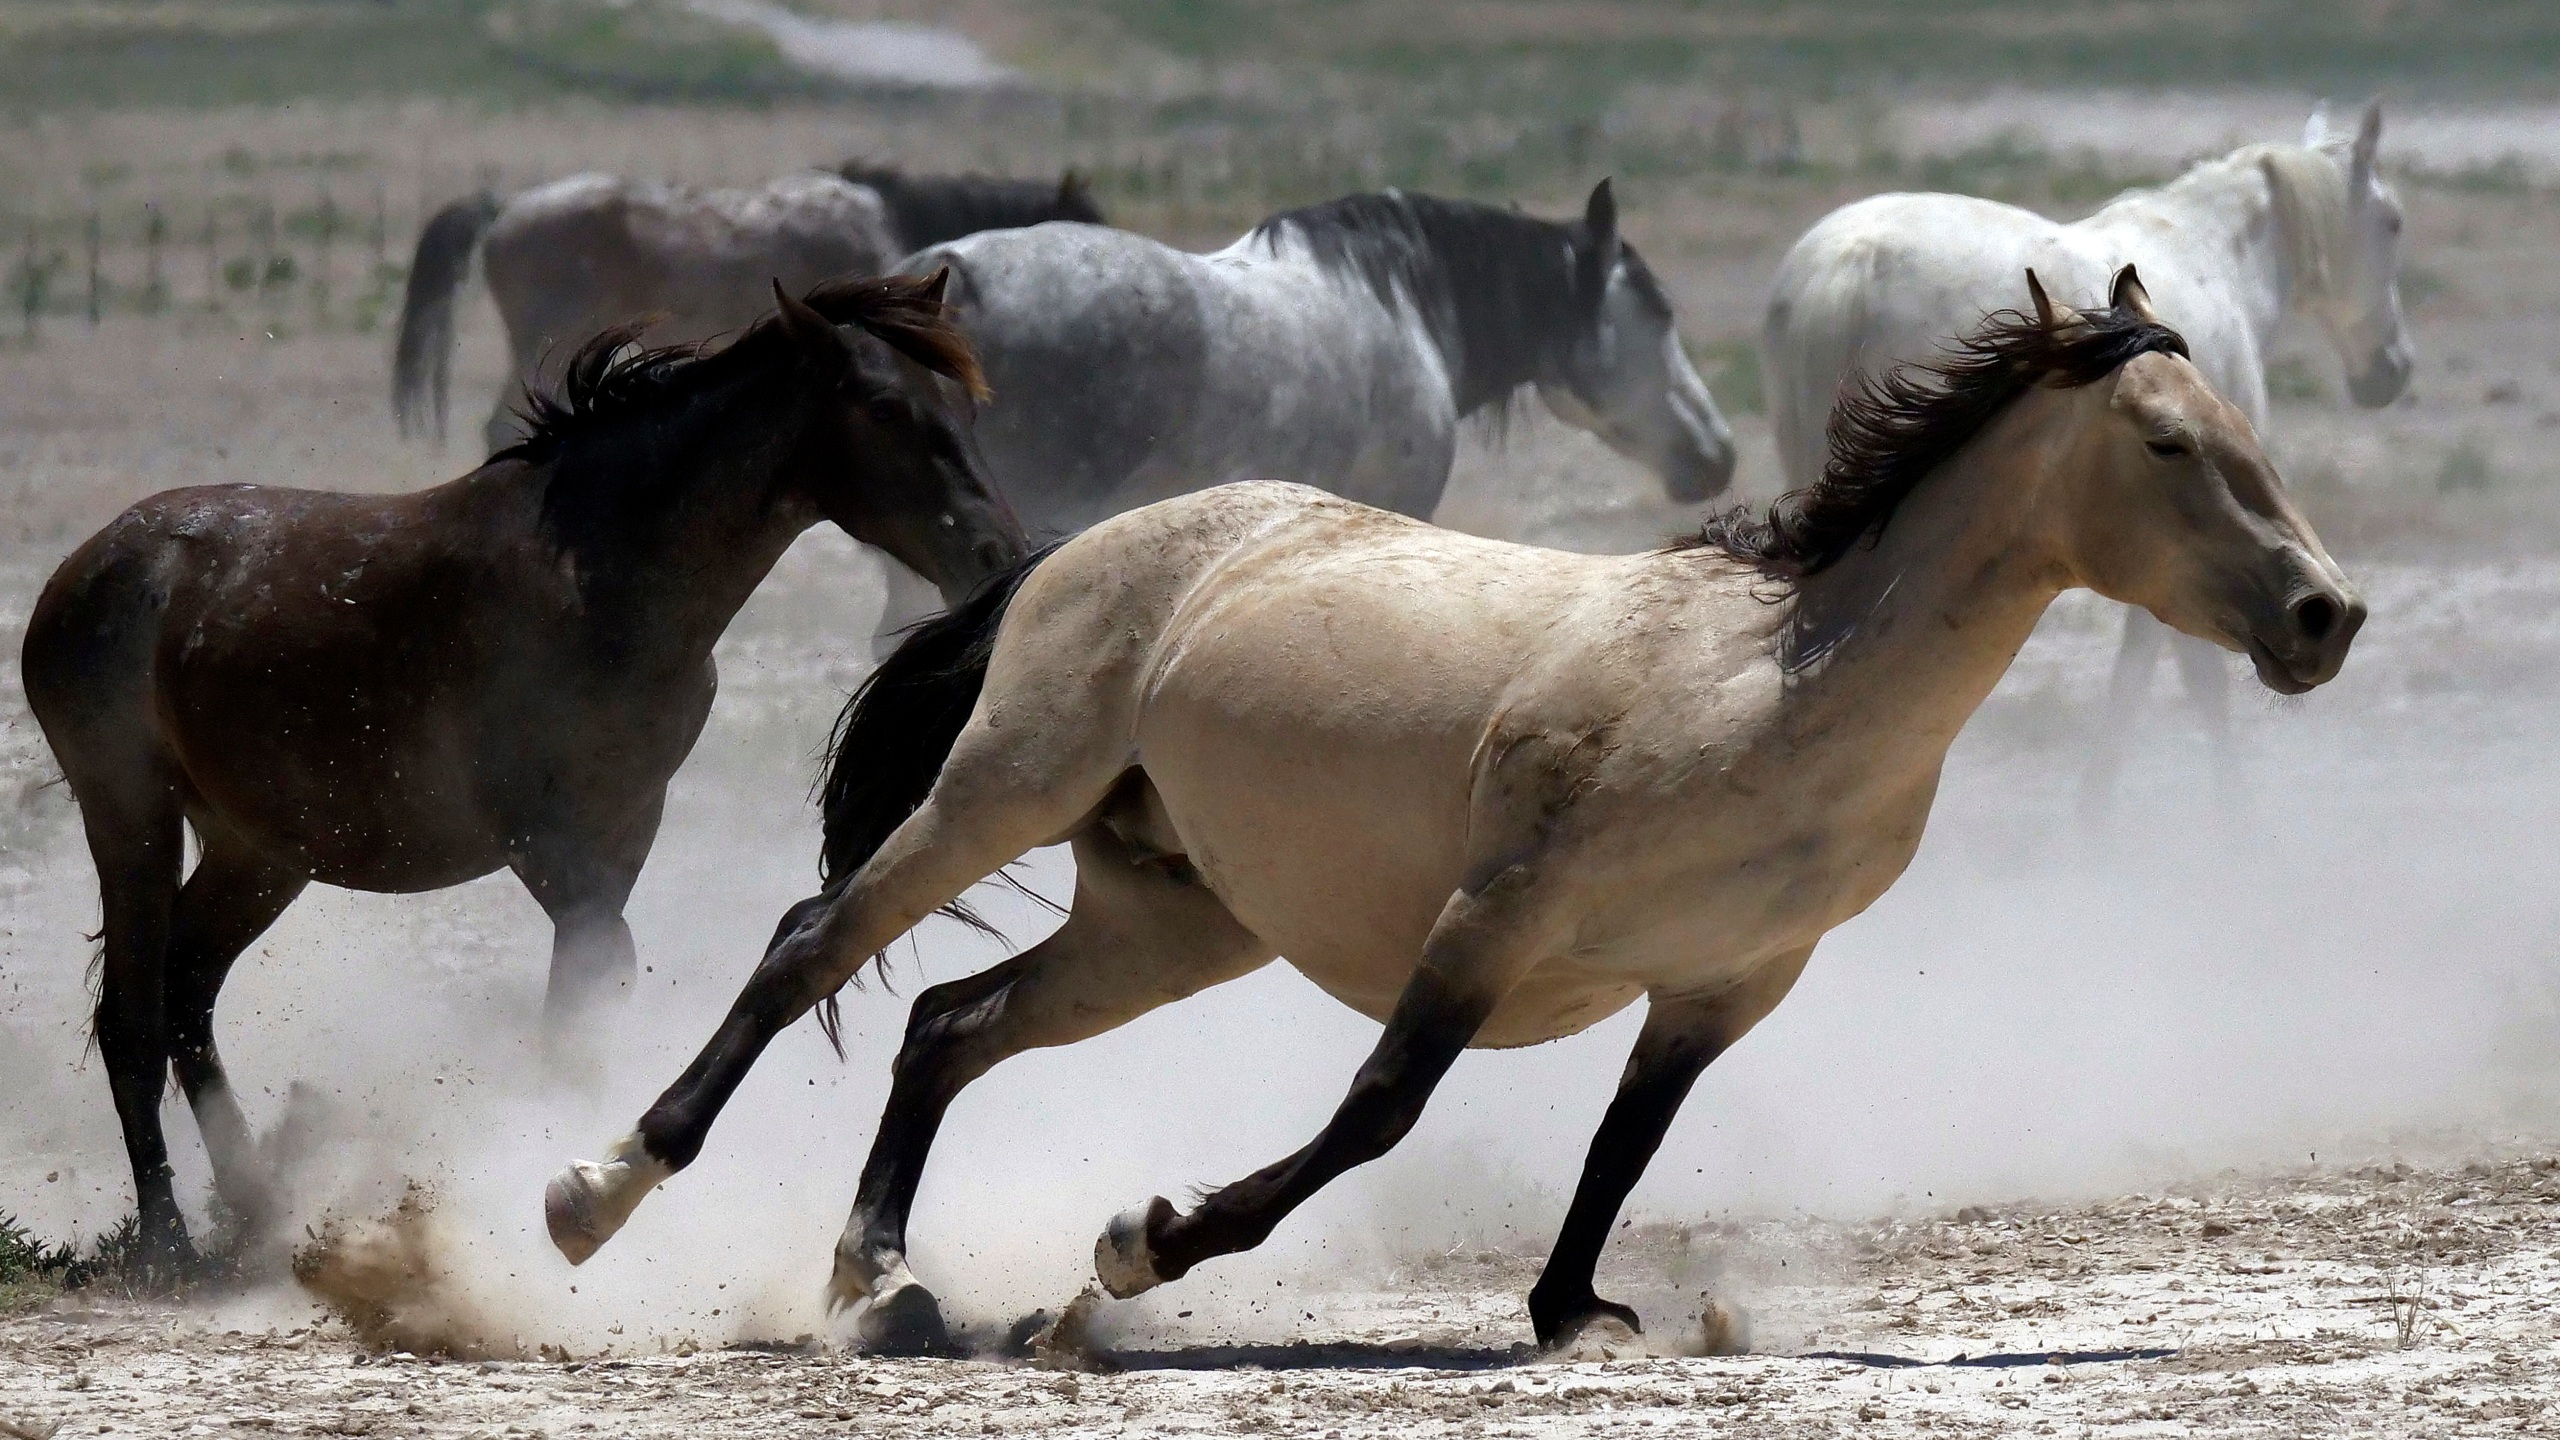 Wild_Horses_Drought_31432-159532.jpg86168741